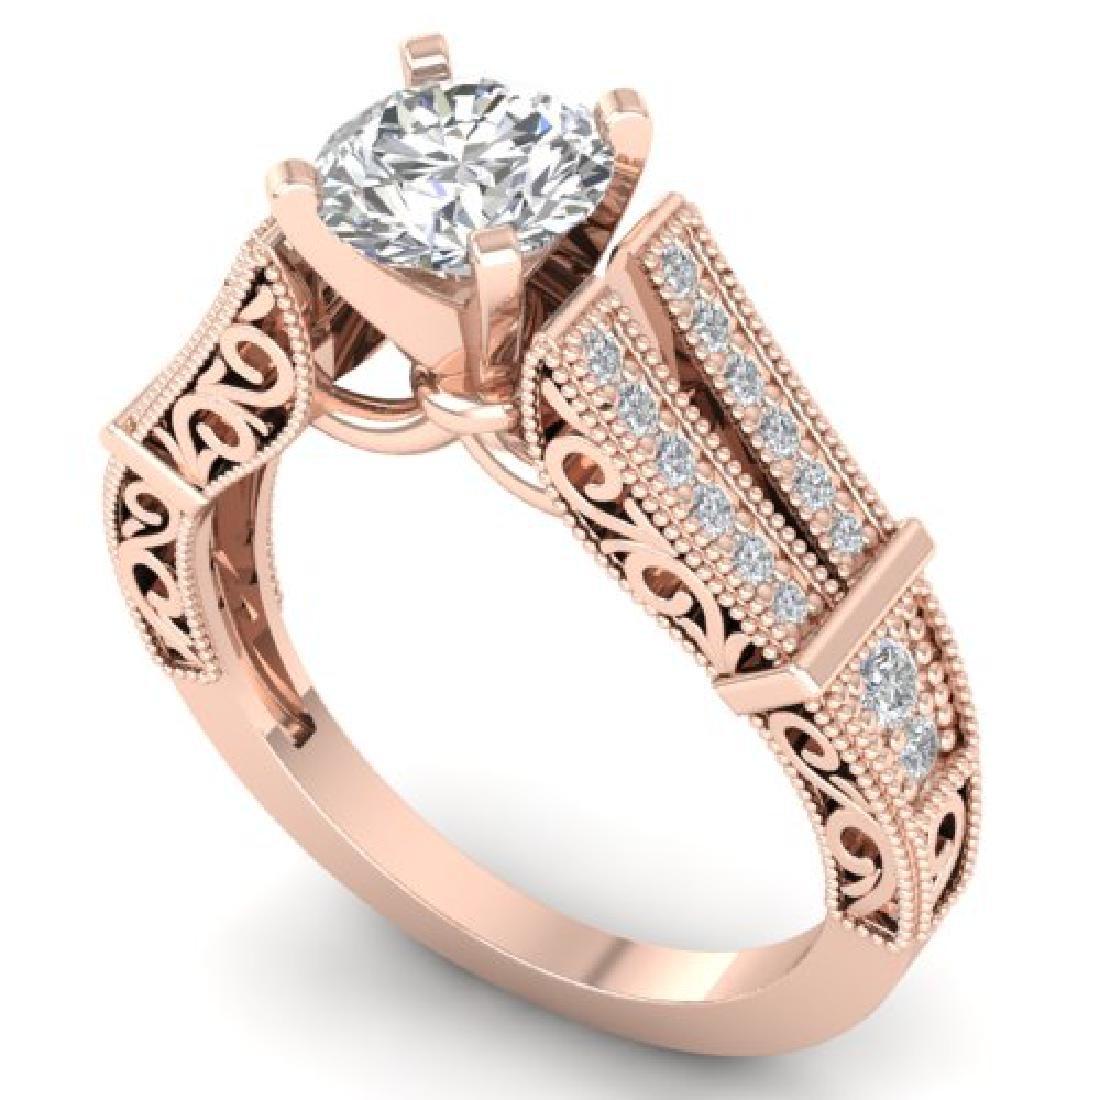 1.5 CTW Certified VS/SI Diamond Solitaire Art Deco Ring - 2